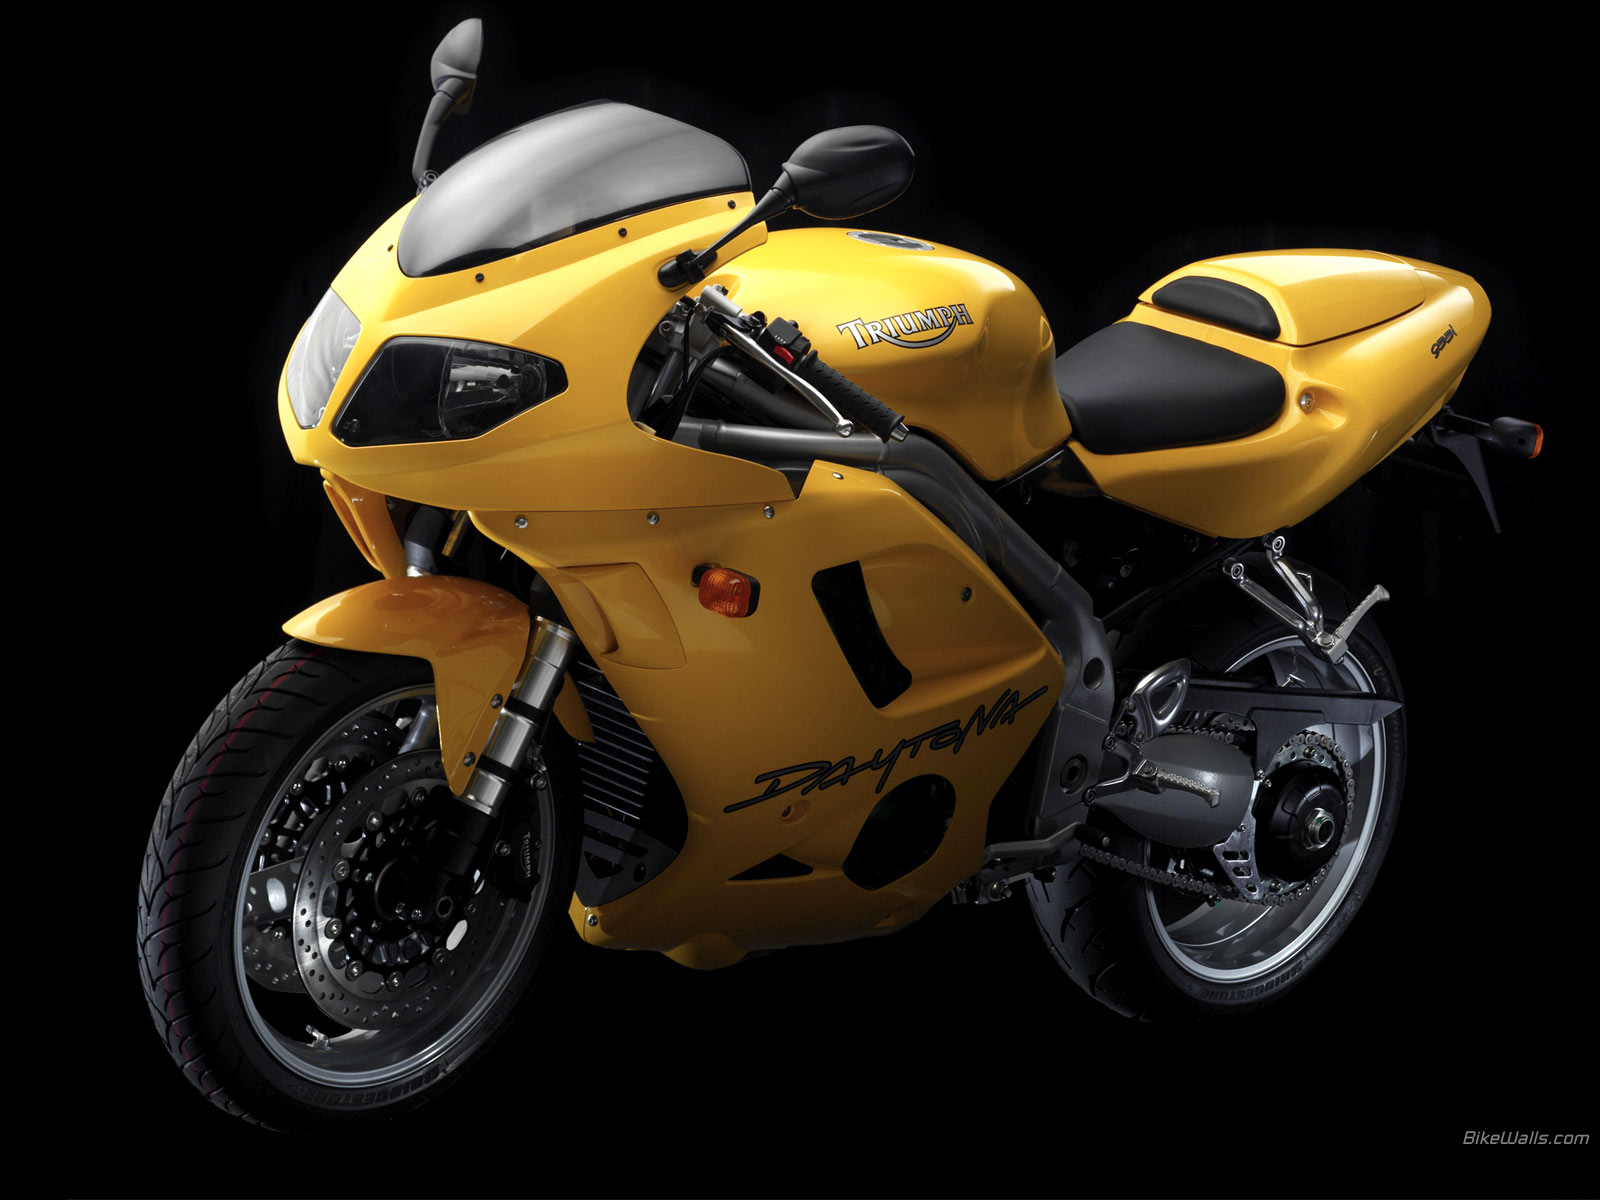 2004 TRIUMPH Daytona 955i Motorcycle Desktop Wallpaper 1600x1200